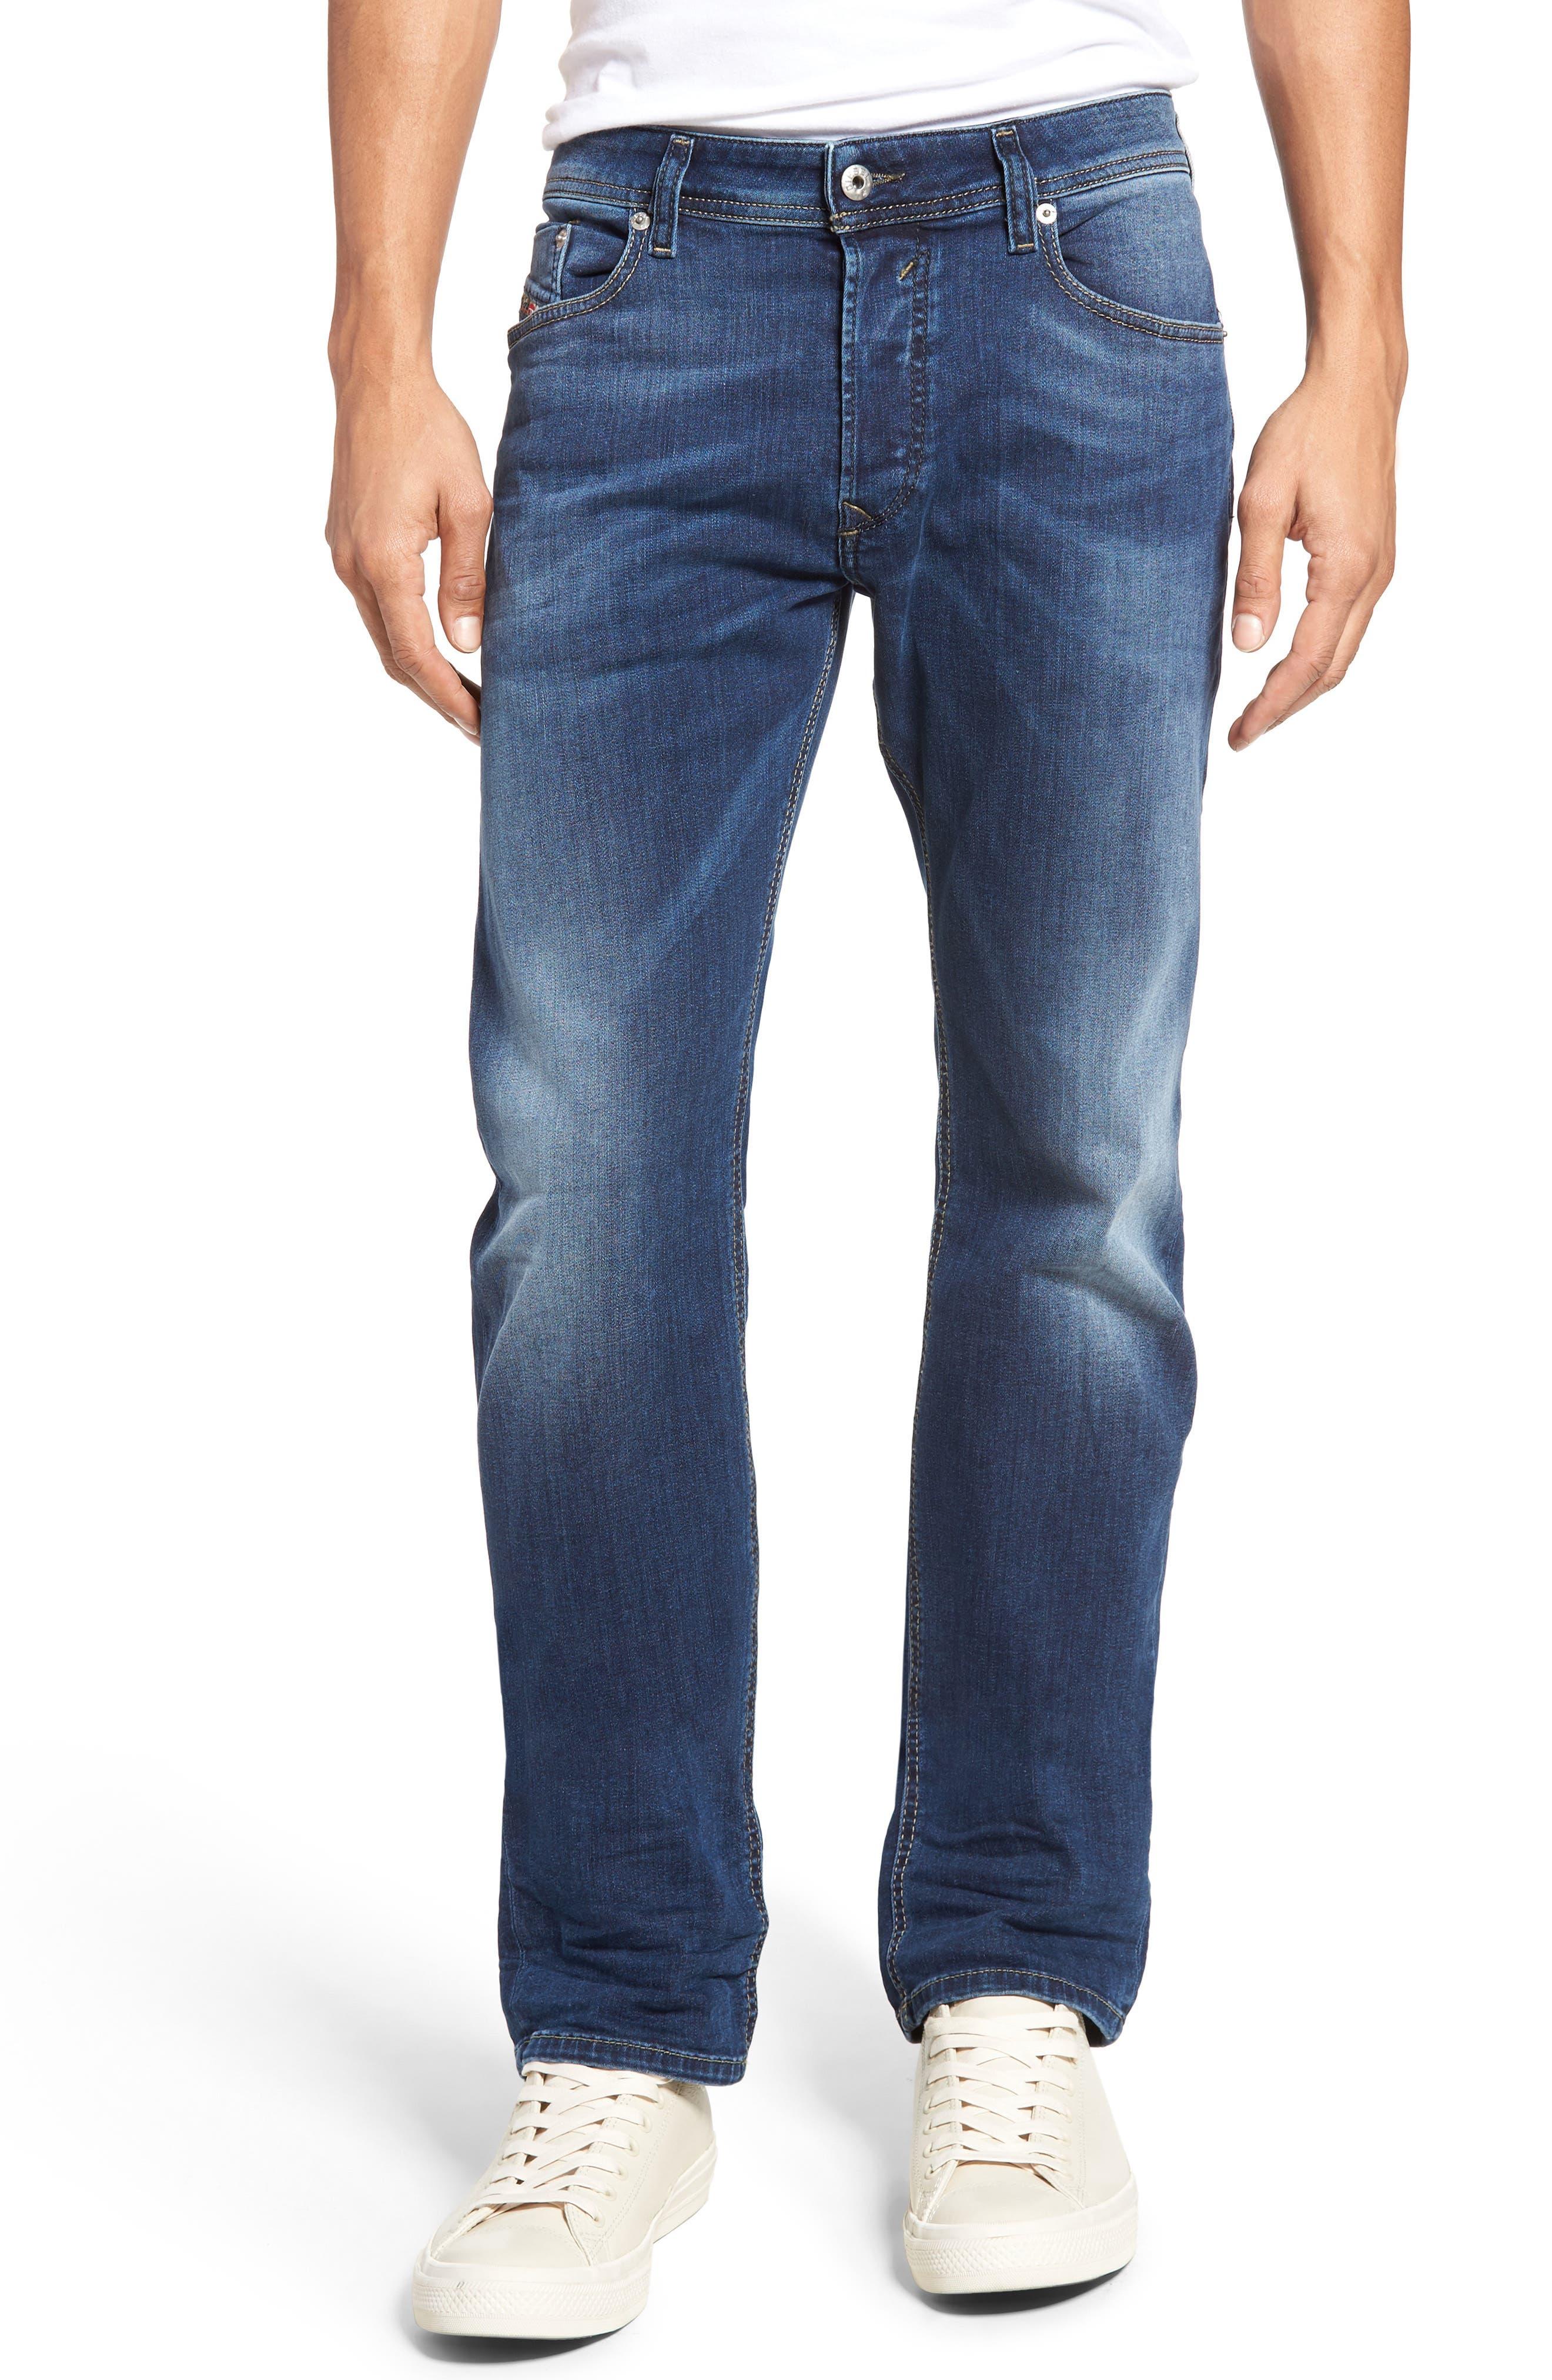 Waykee Straight Leg Jeans,                         Main,                         color, 0679I